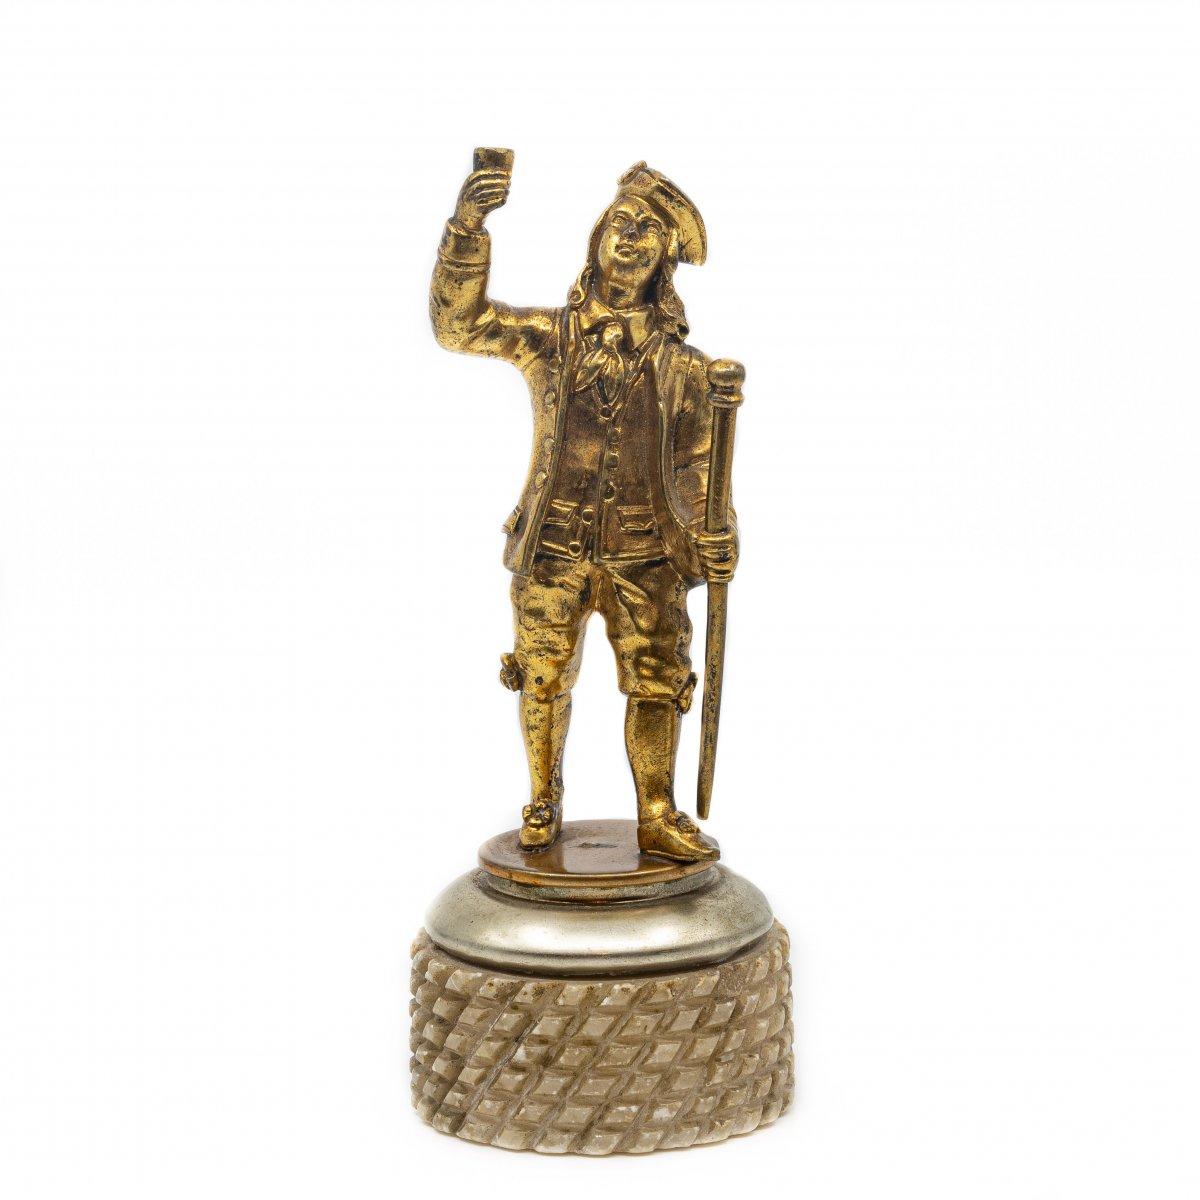 Gentleman In Gilt Bronze - France, 2nd Half Of The 18th Century